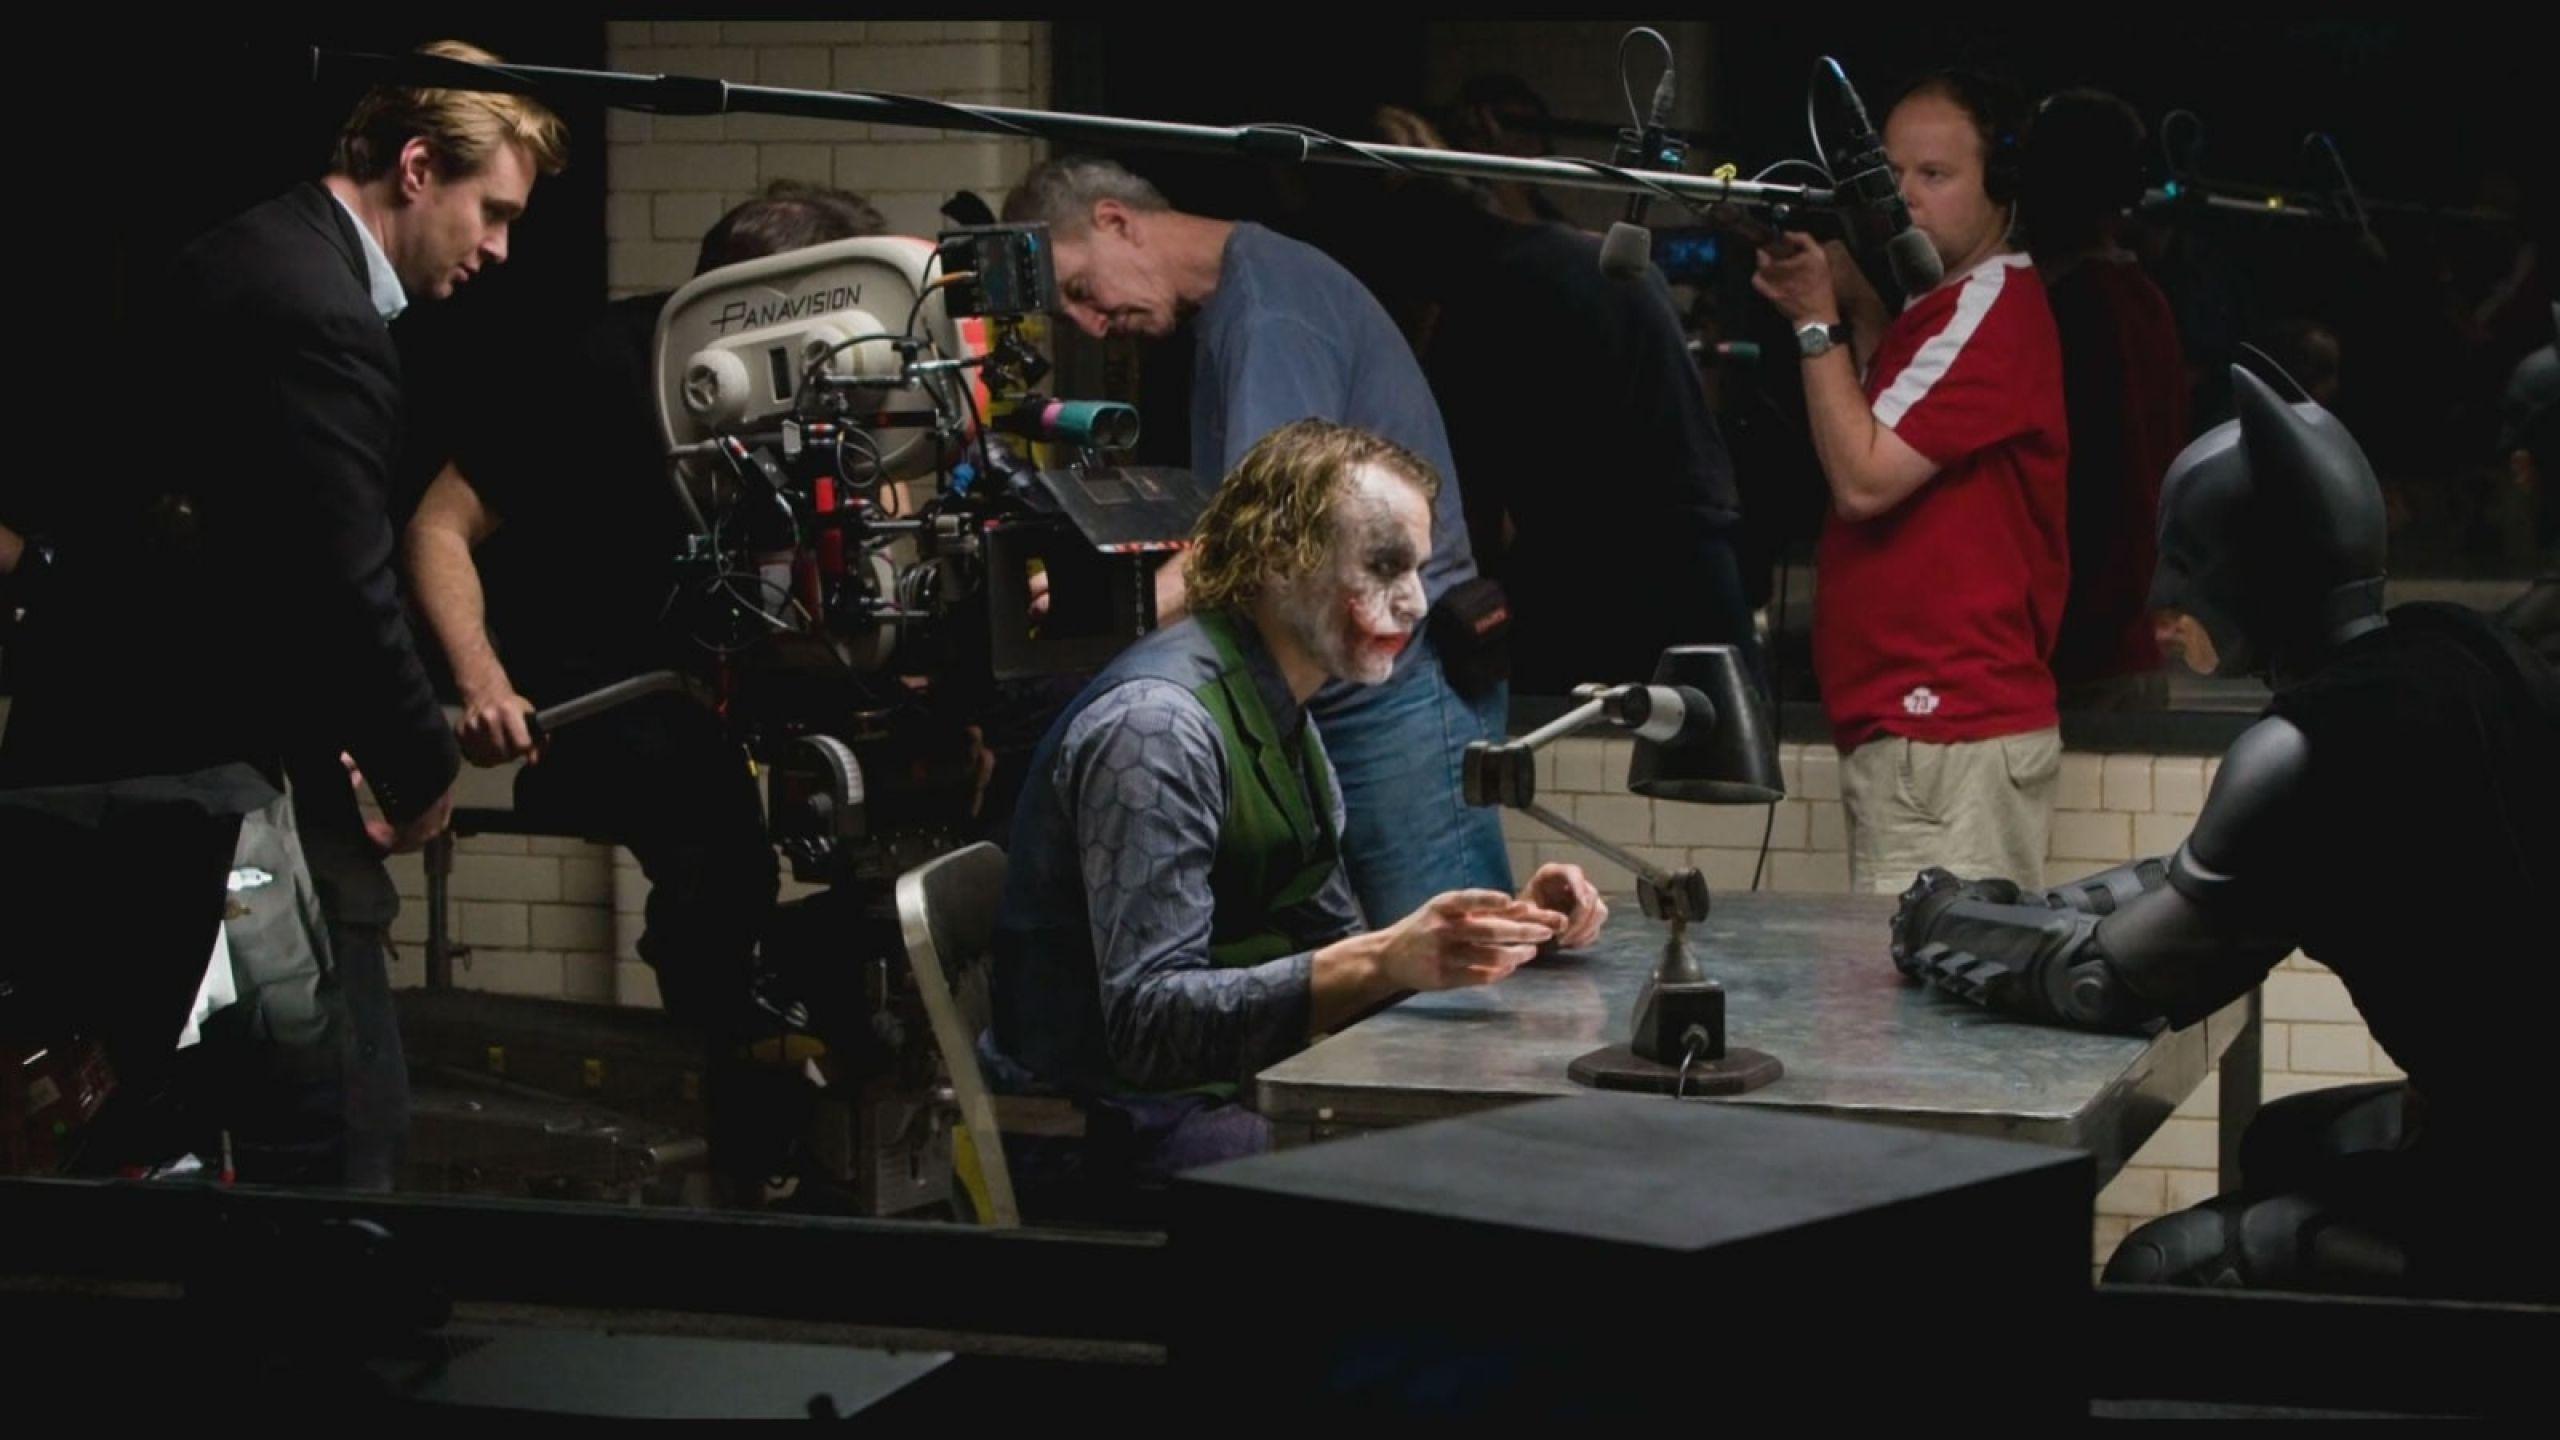 Christopher Nolan - Heath Ledger - Christian Bale (The Dark Knight)